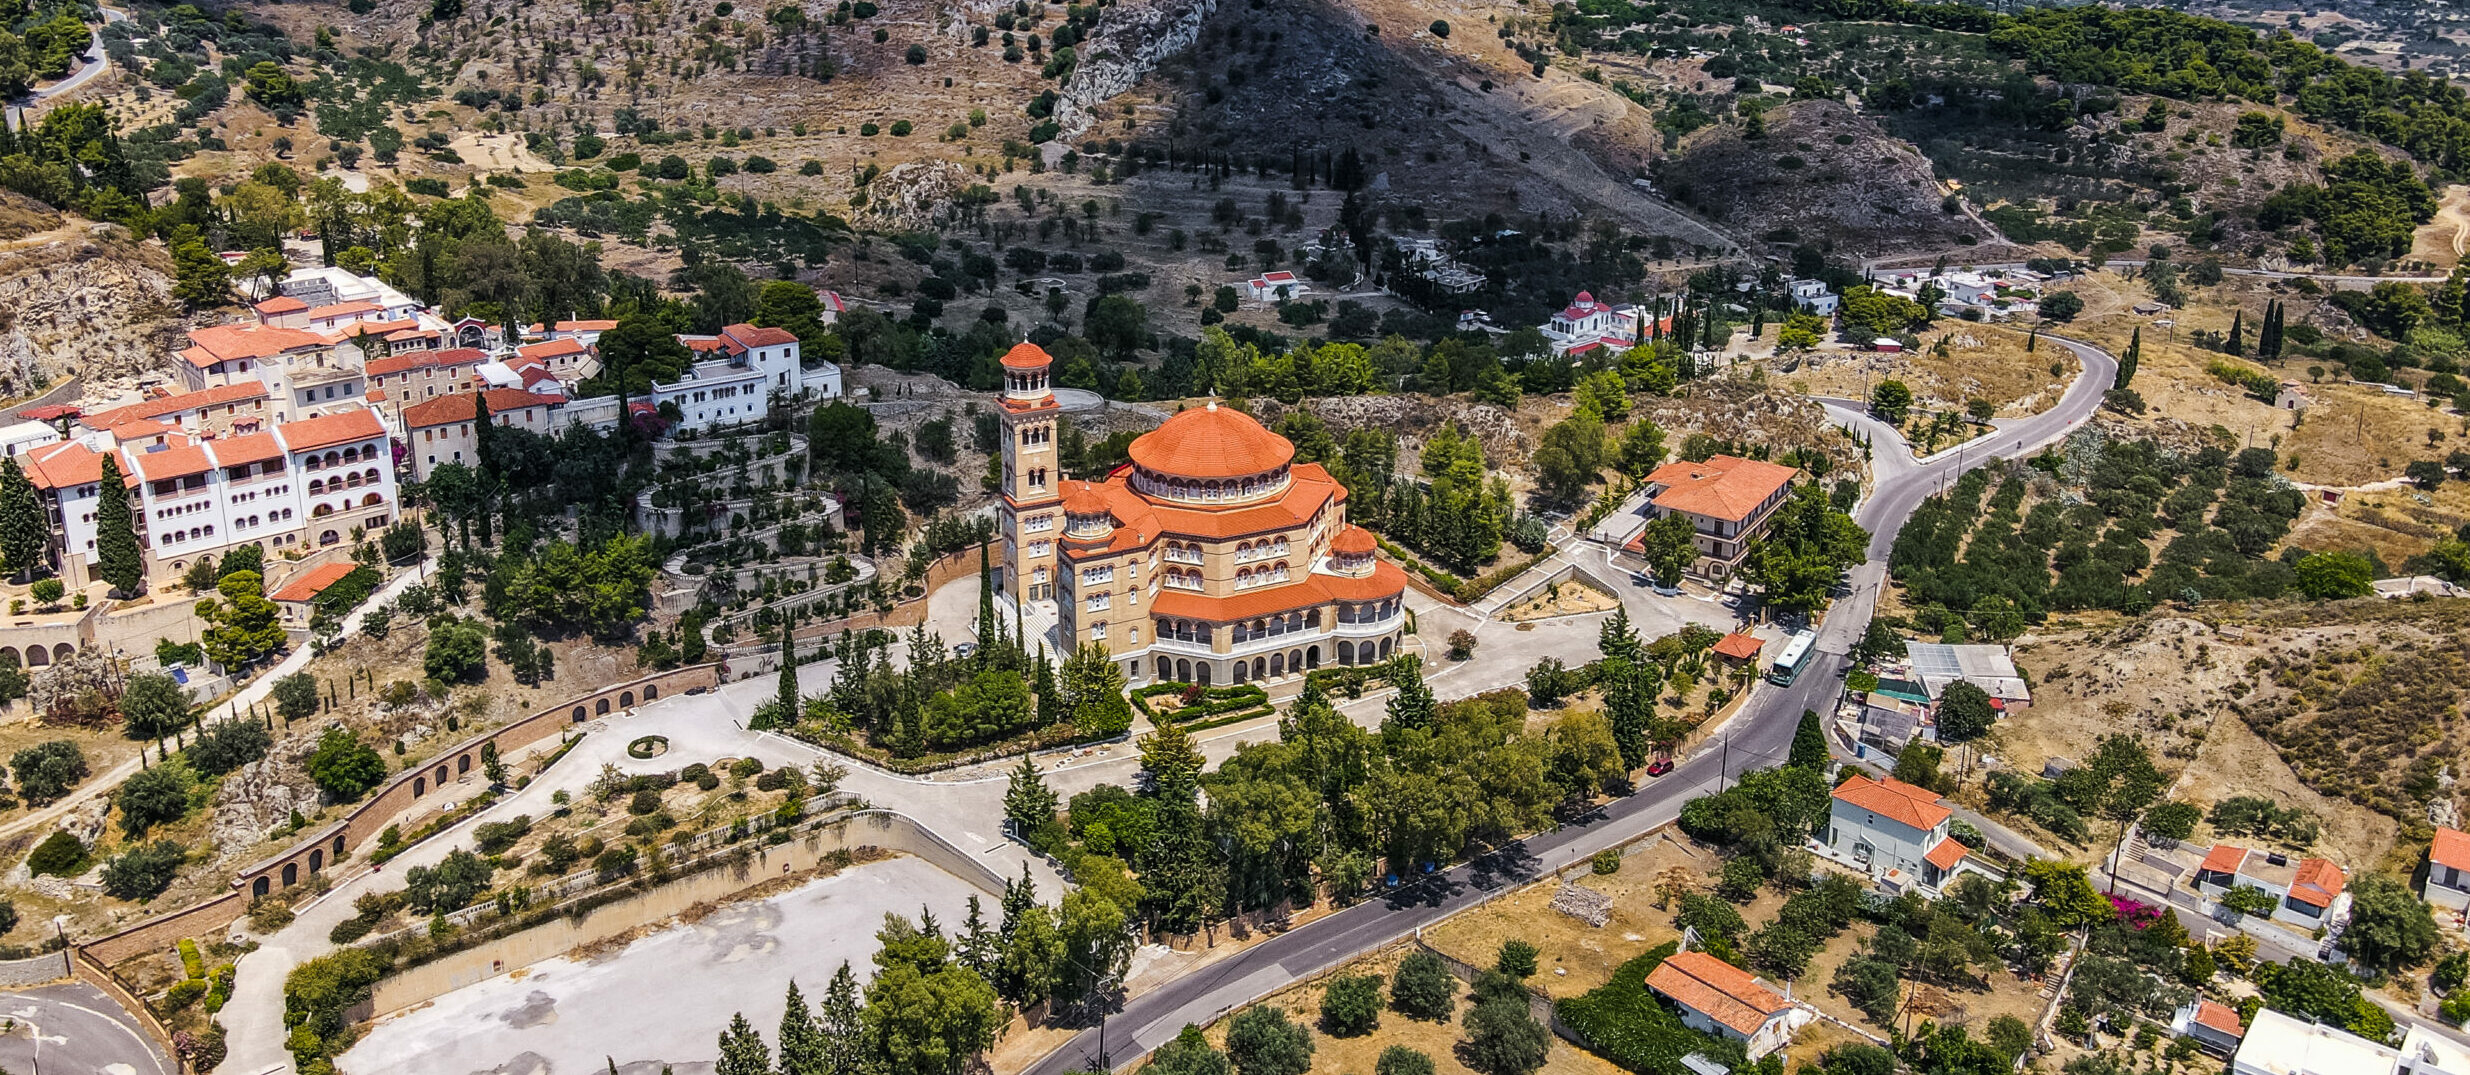 Aegina: The port and Mystras